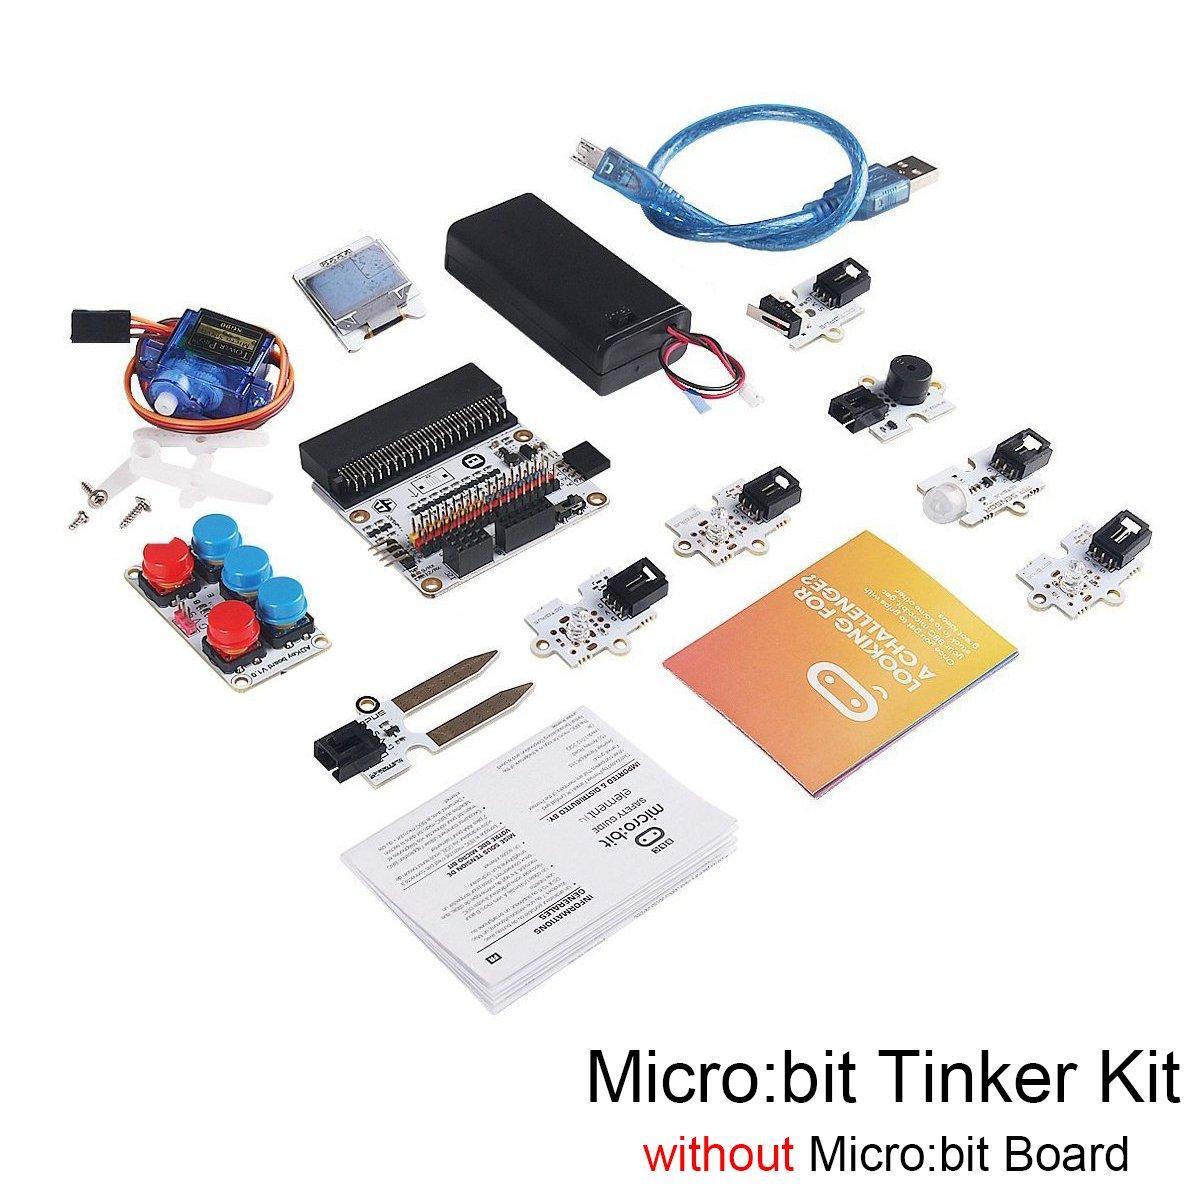 Micro:bit Tinker Kit w/o Micro:bit Board, Include Micro:bit Breakout Board, OCTOPUS PIR Sensor Module for Classroom Teaching and DIY Beginners